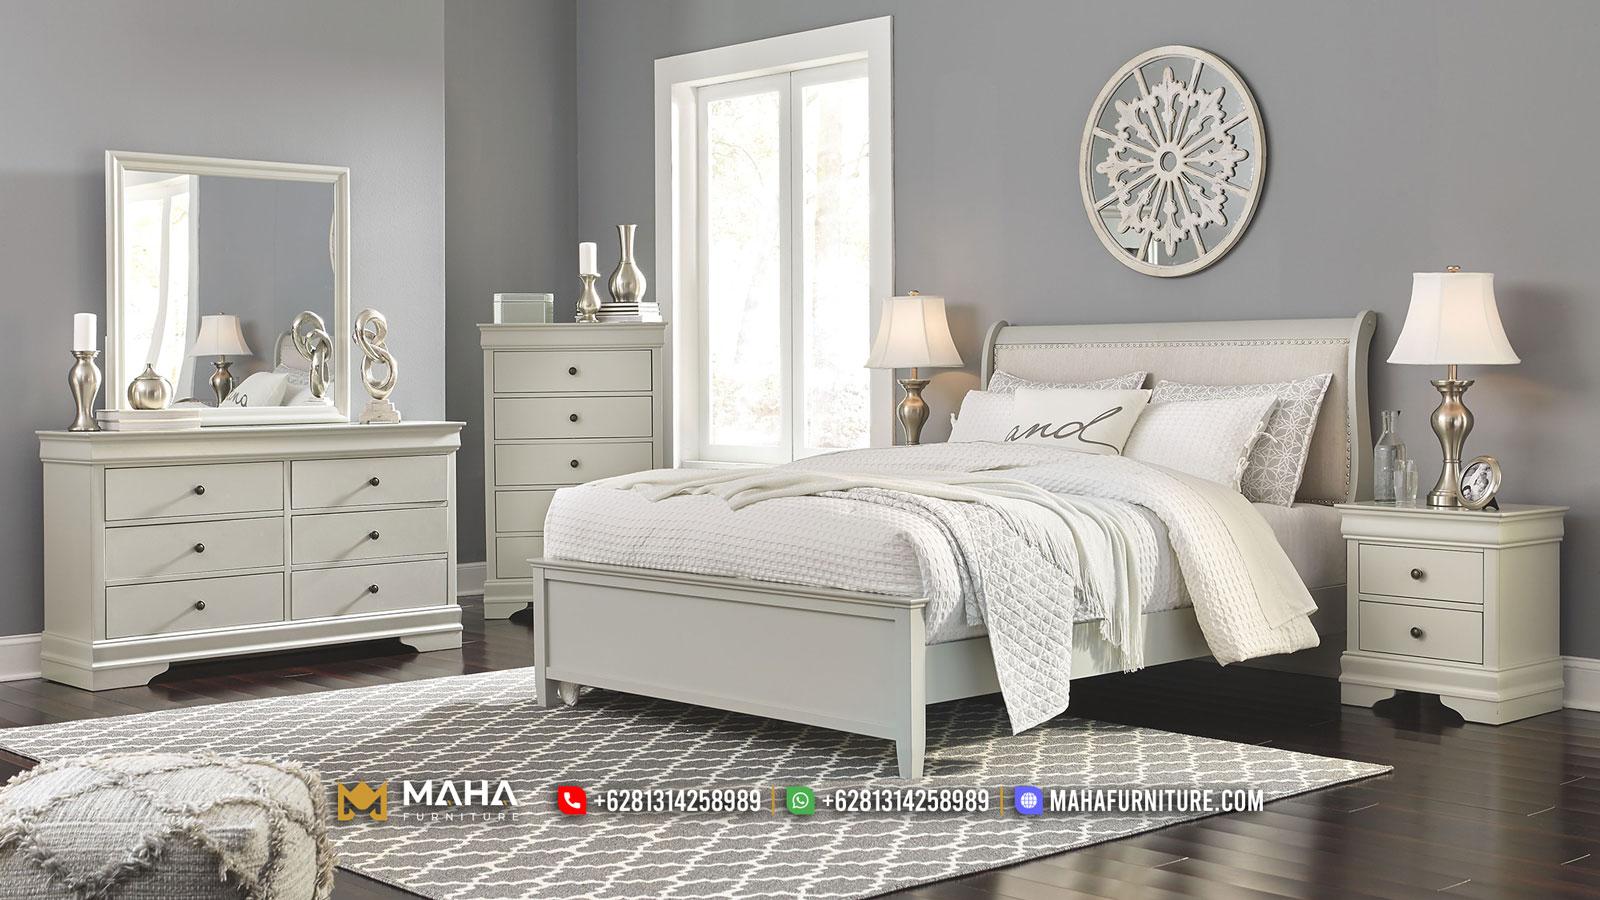 New Product Tempat Tidur Jepara Minimalis White Duco MF350